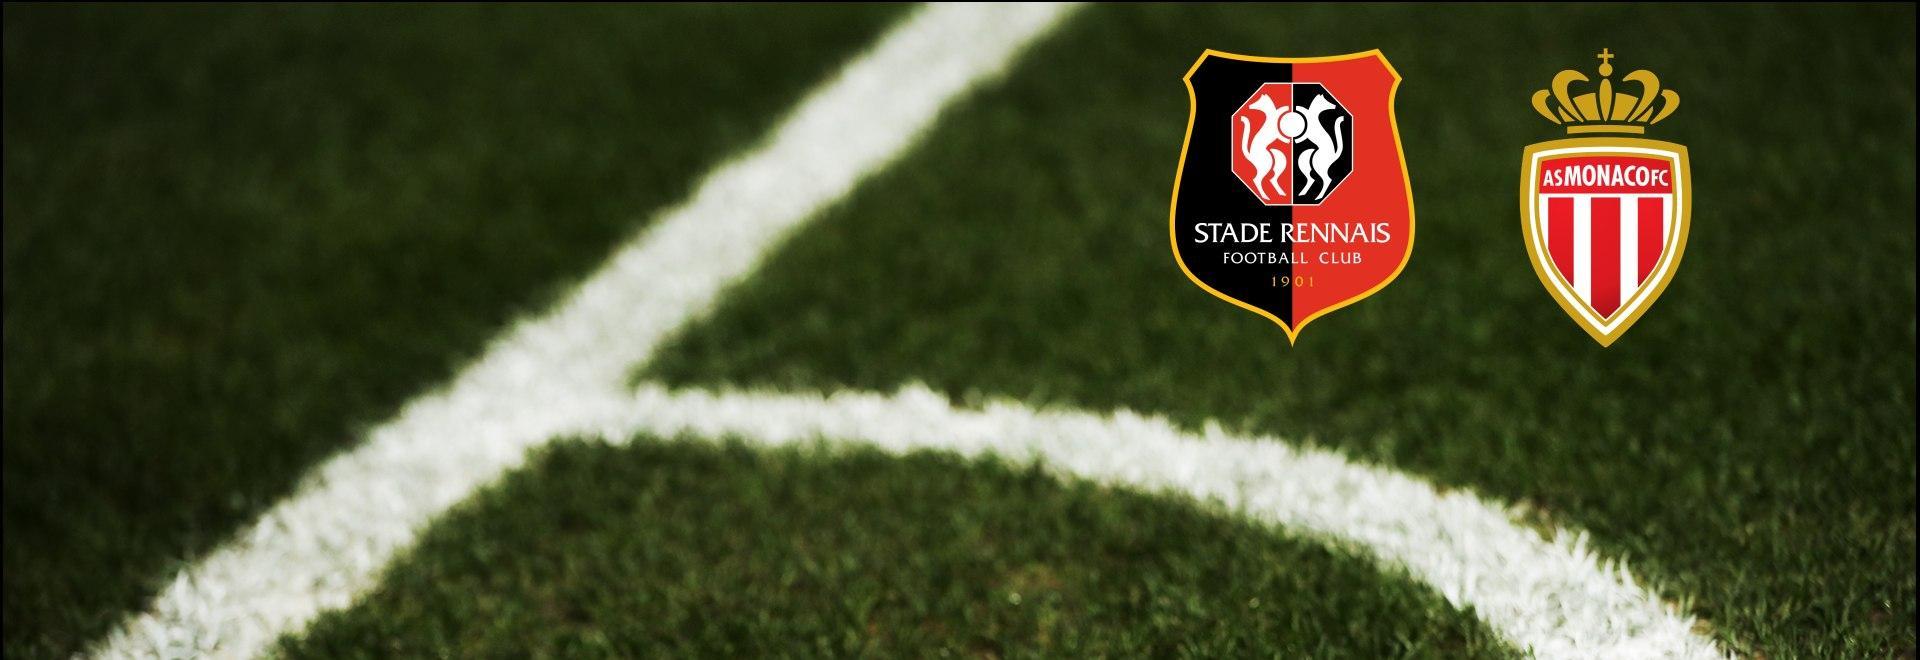 Rennes - Monaco. 4a g.